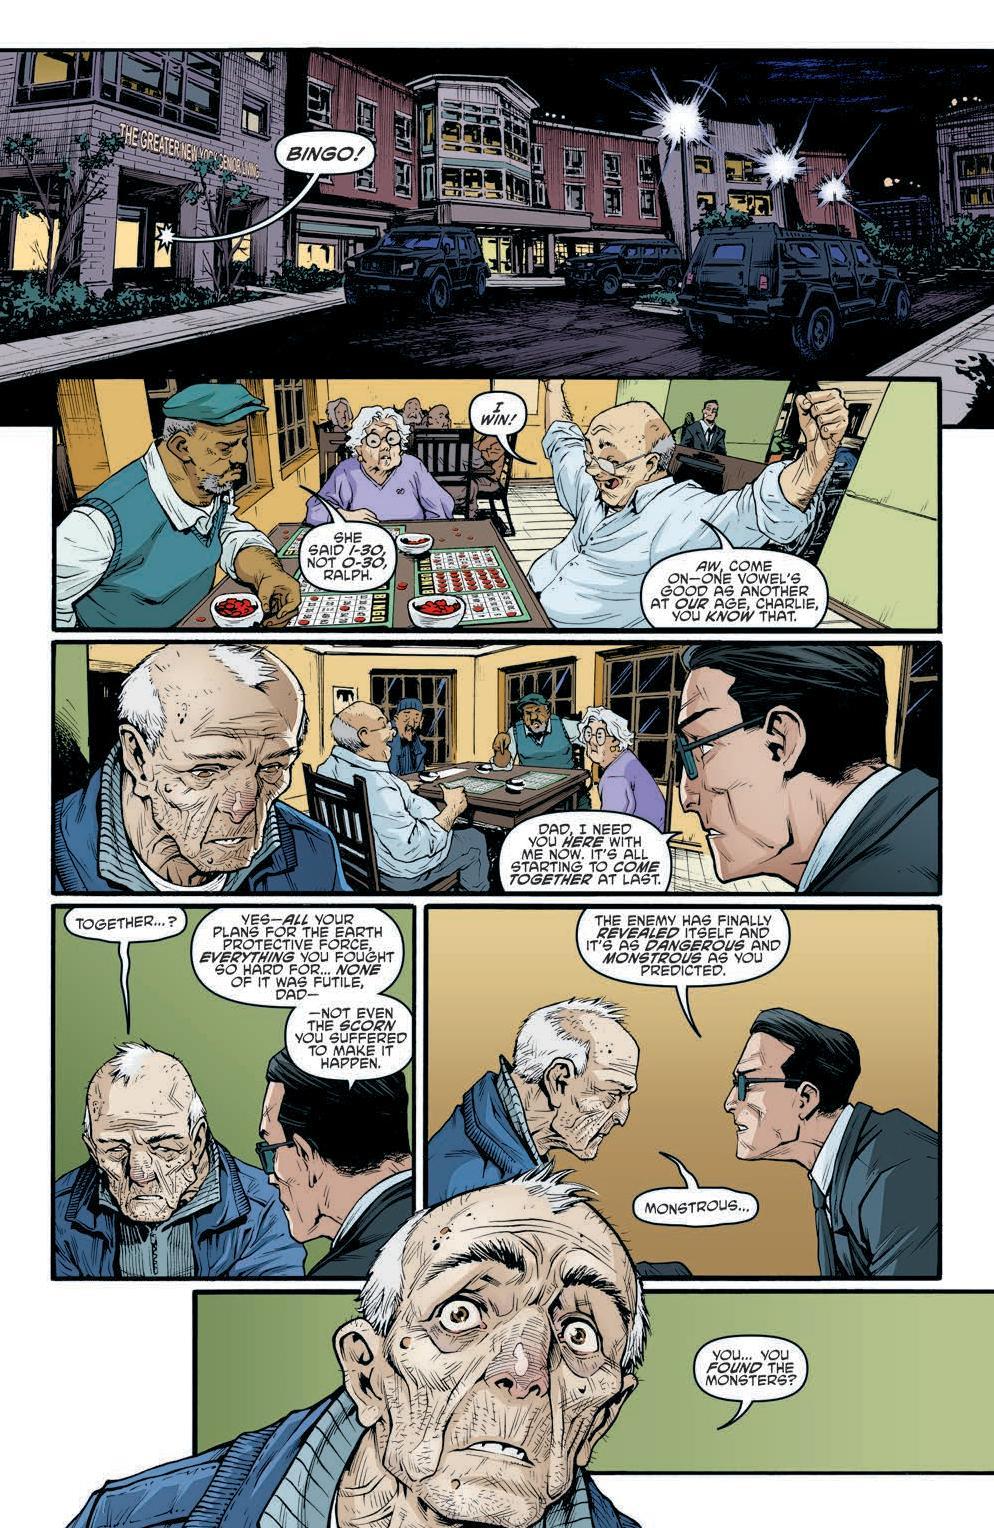 TMNT_69-pr-page-006